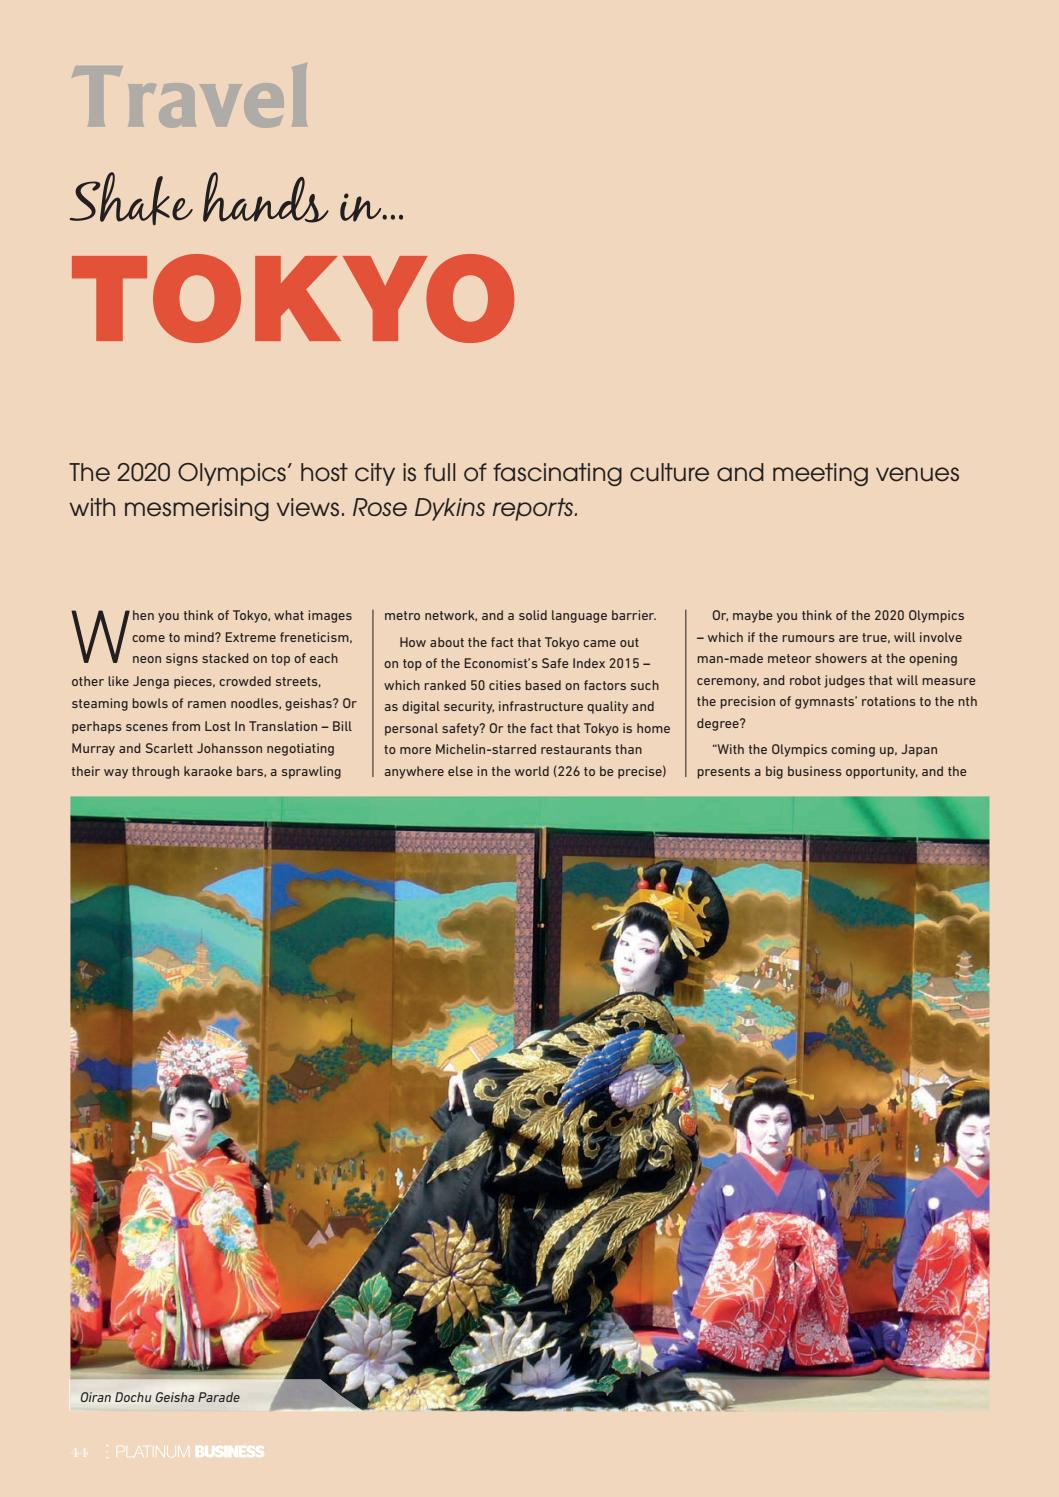 PLATINUM BUSINESS MAGAZINE - ISSUE 25 - SURREY EDITION by